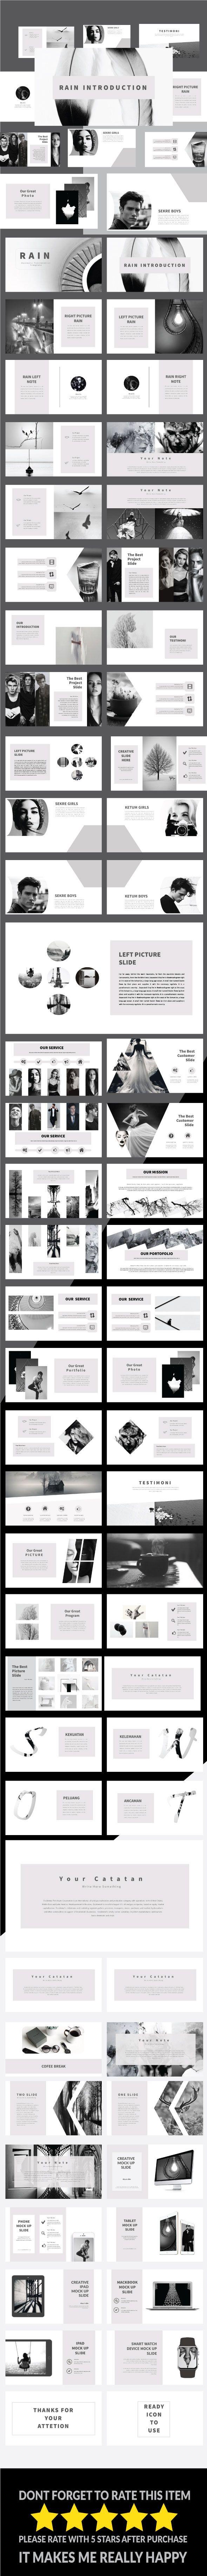 Rain - Multipurpose PowerPoint Template | Kreativ, Präsentation ...